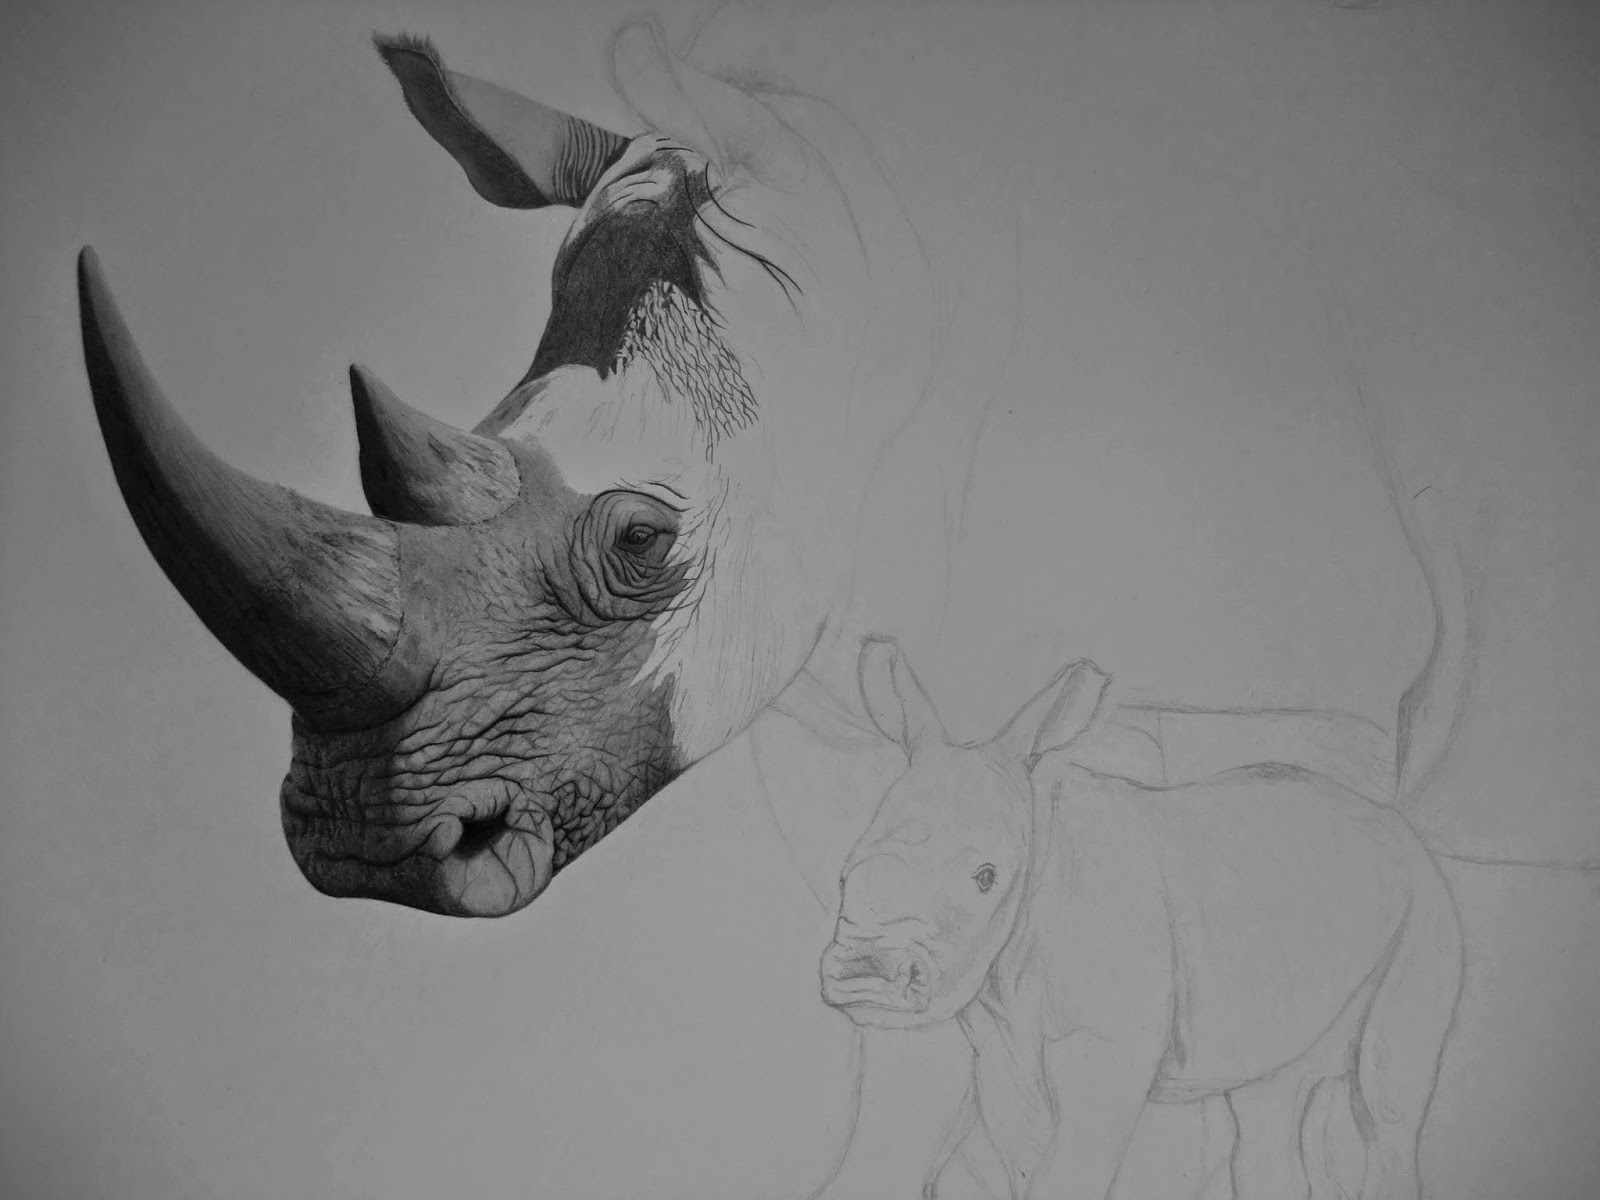 antoine roquain dessin animalier wildlife pencil art rhinoc ros blancs. Black Bedroom Furniture Sets. Home Design Ideas